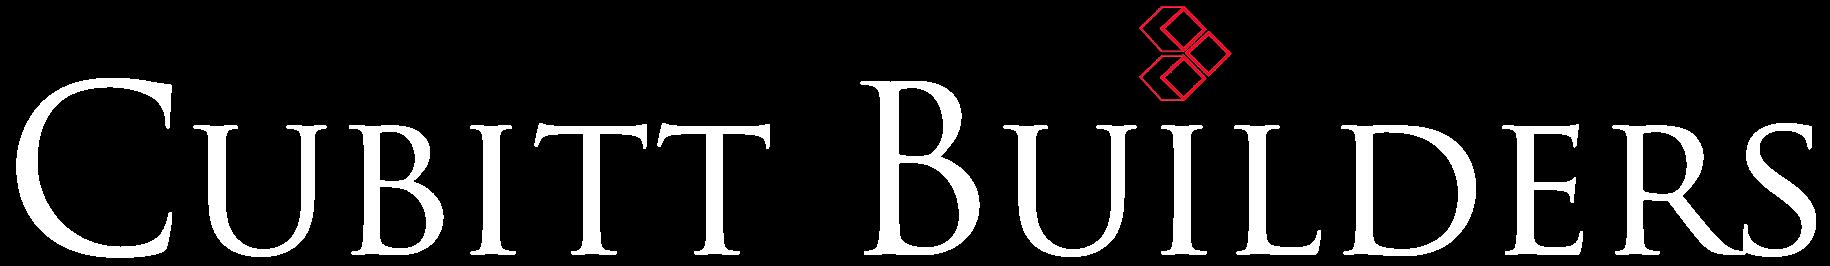 Cubitt Builders Logo